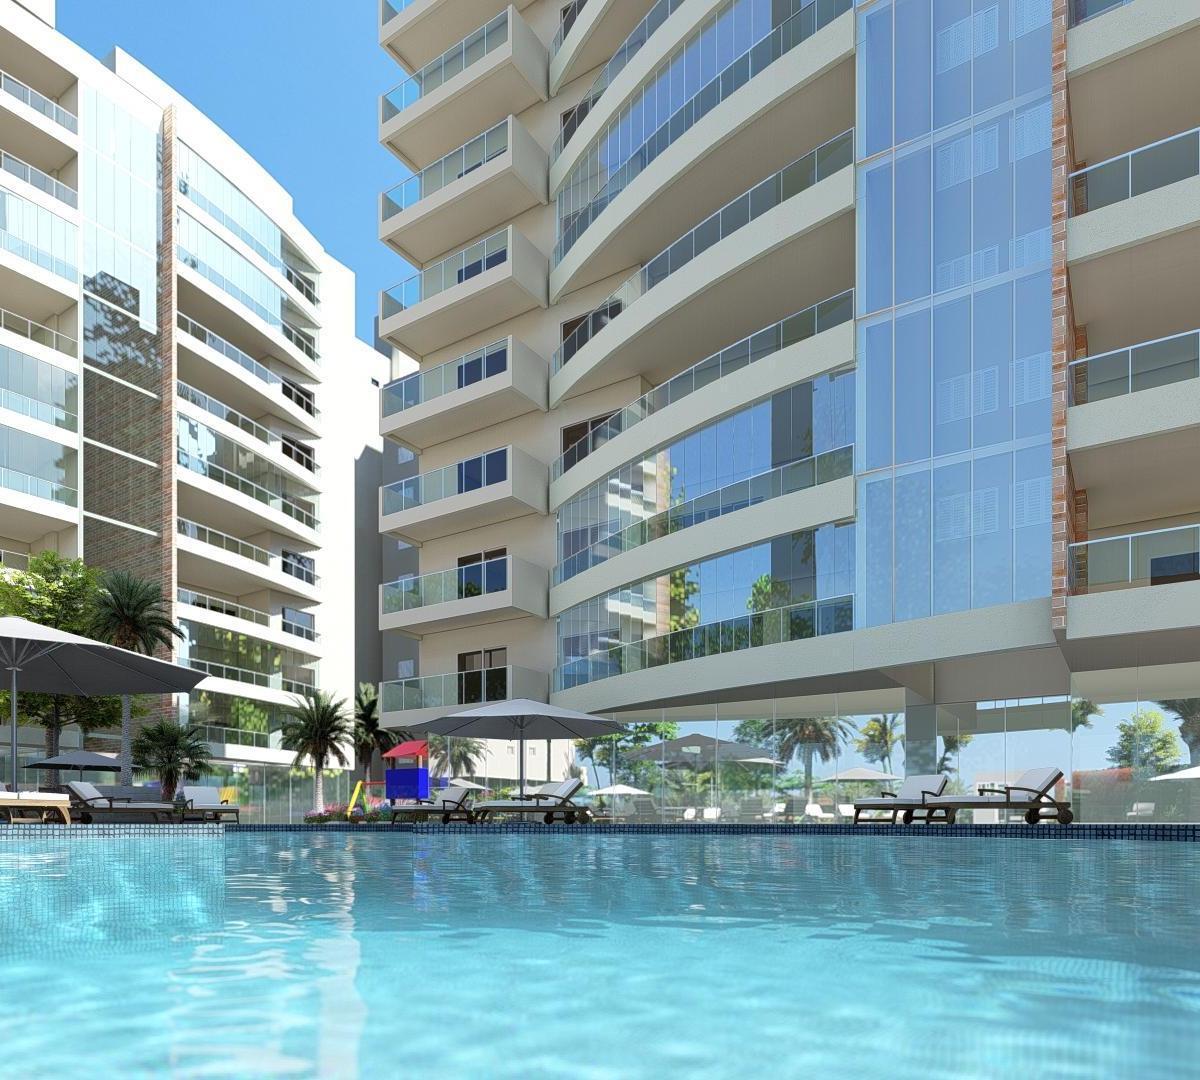 Apartamento em Caraguatatuba - Calabasas Ocean Front